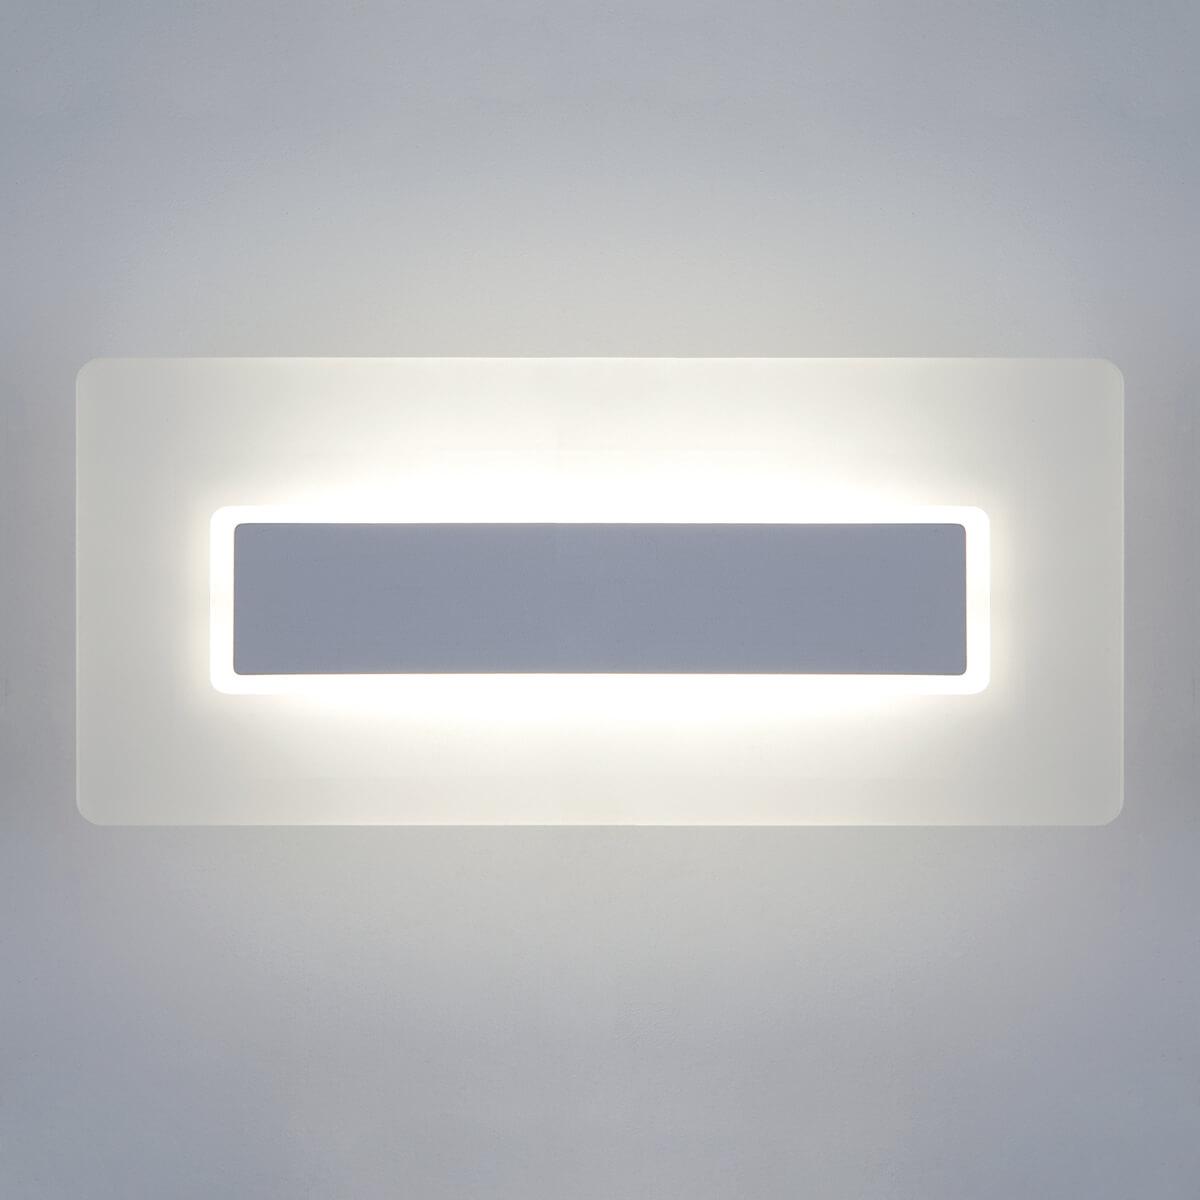 Светильник Eurosvet 40132/1 Led белый Square